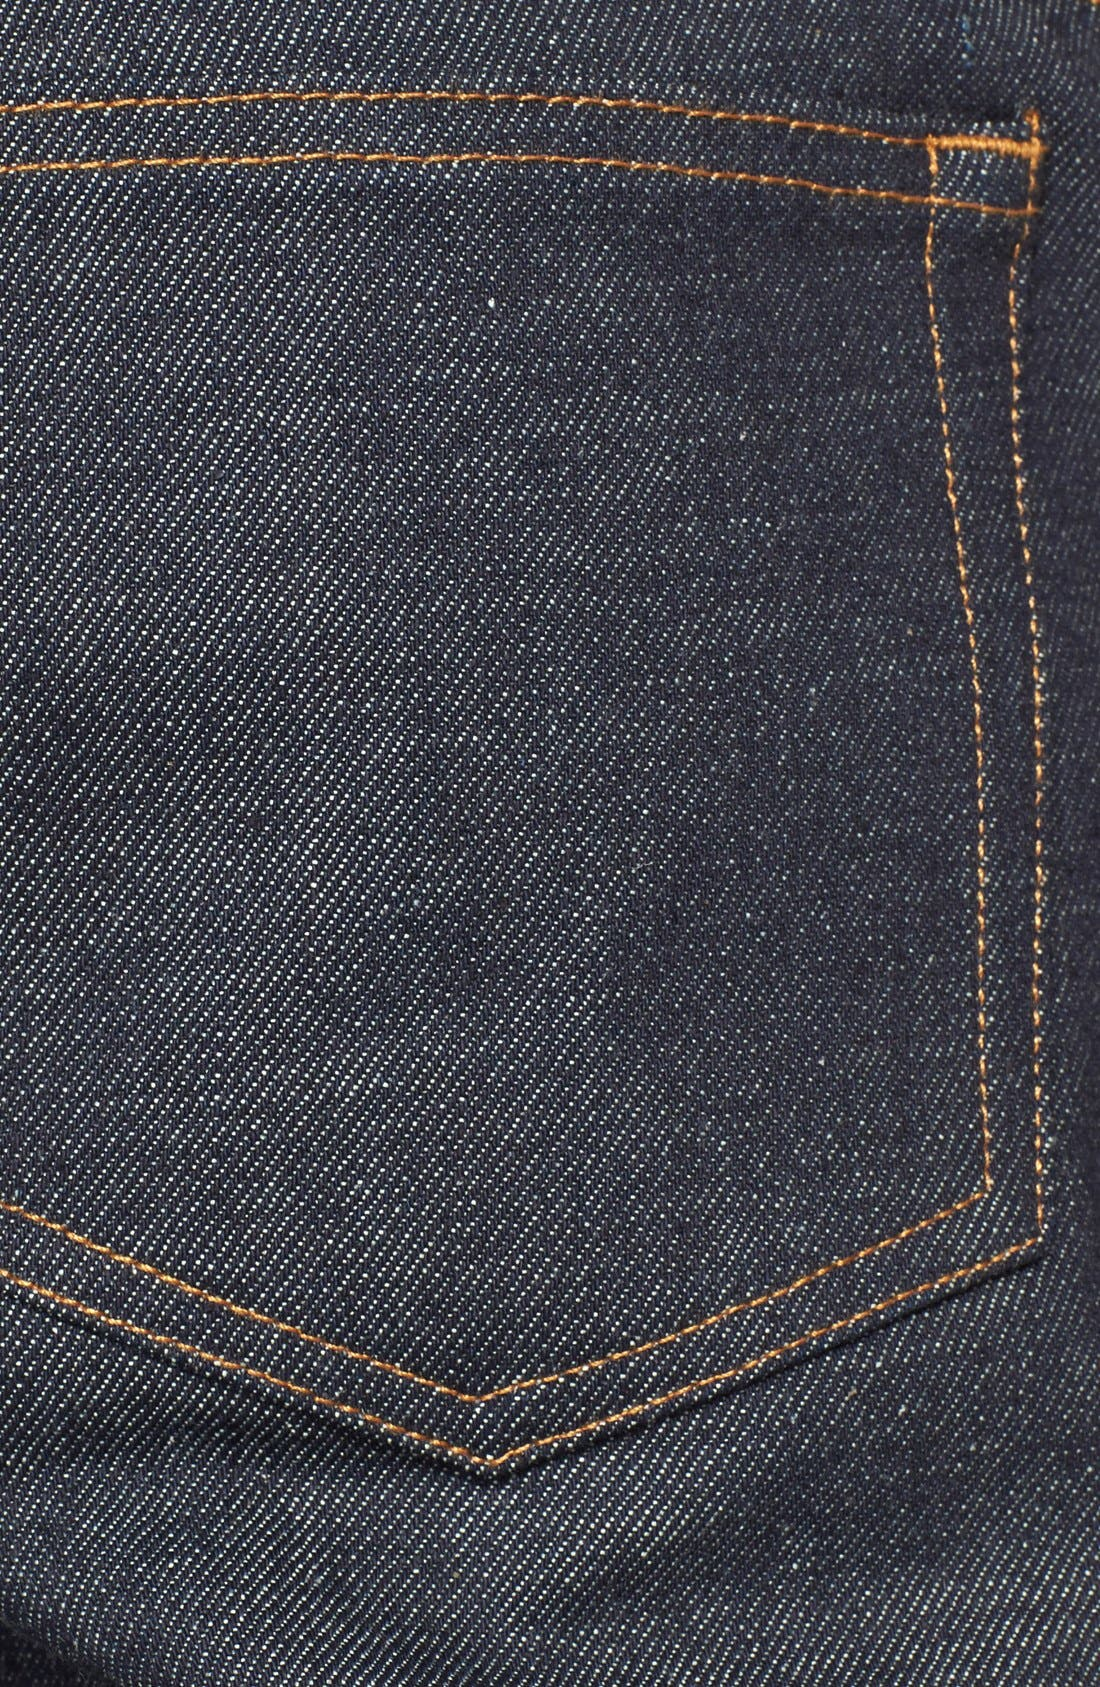 Petit New Standard Slim Straight Leg Selvedge Jeans,                             Alternate thumbnail 4, color,                             Indigo Wash